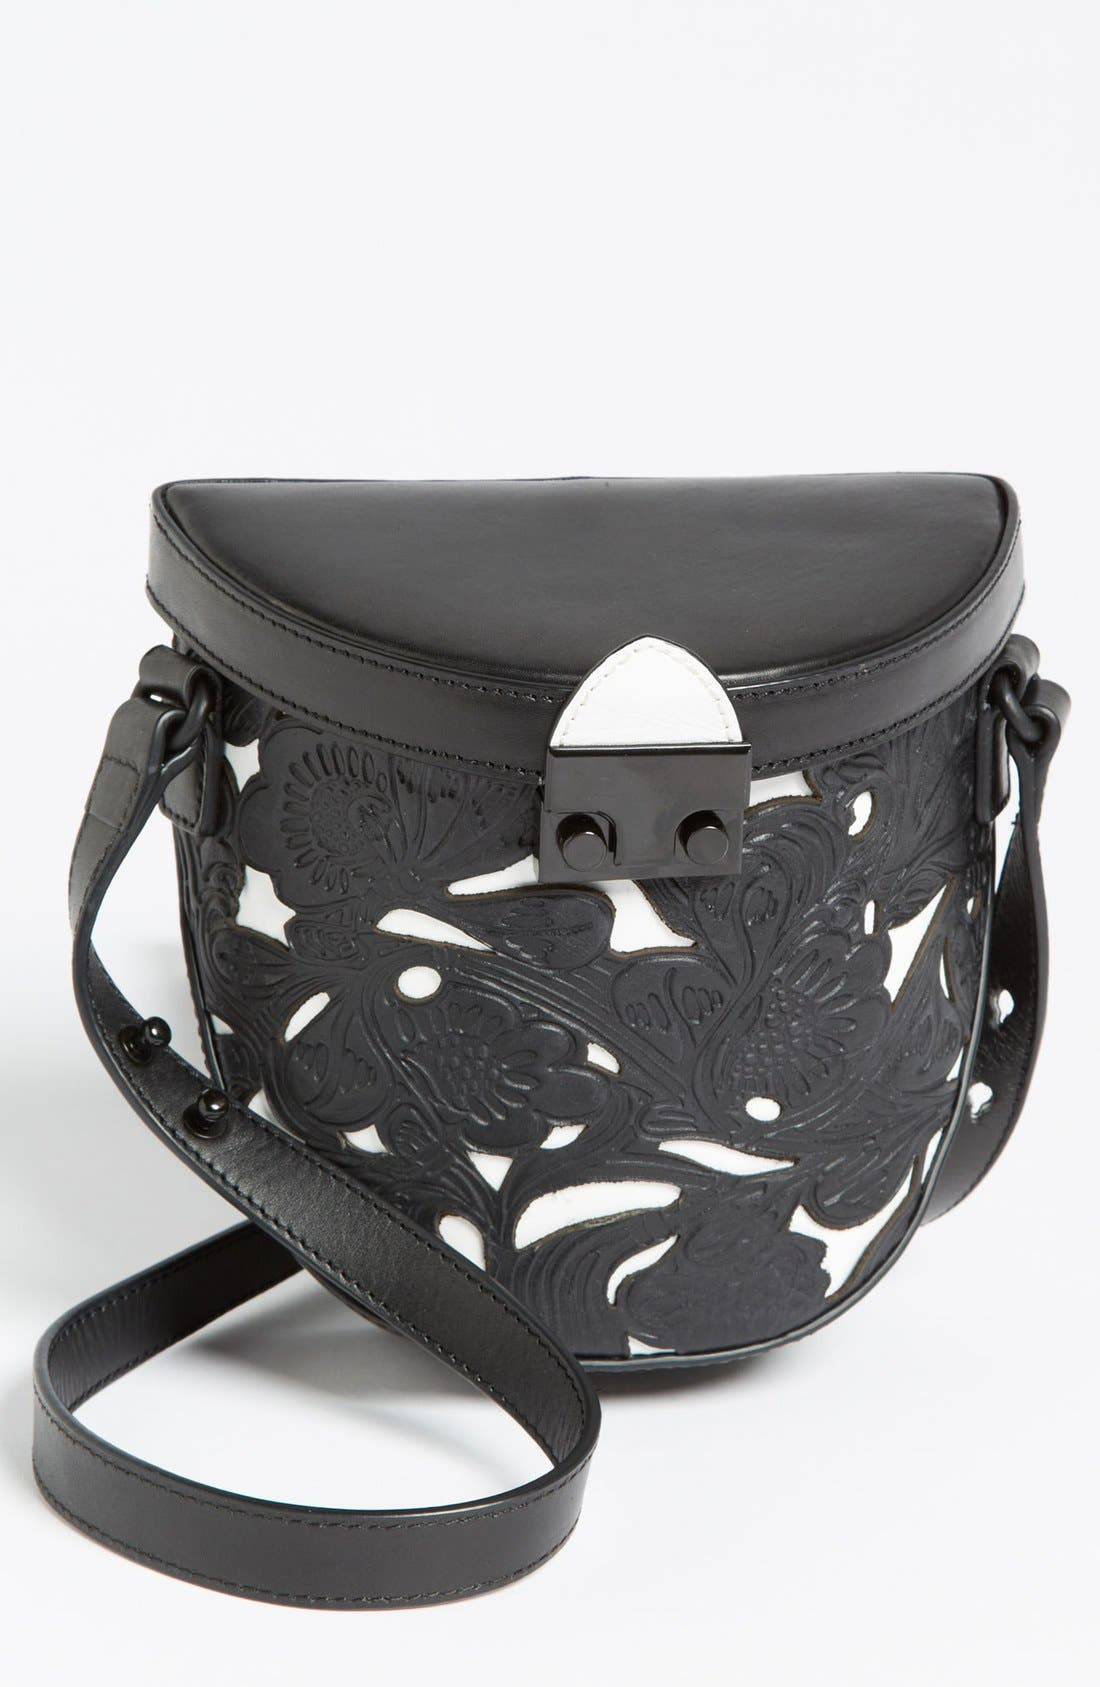 Alternate Image 1 Selected - Loeffler Randall 'Shooter' Leather Crossbody Bag, Small